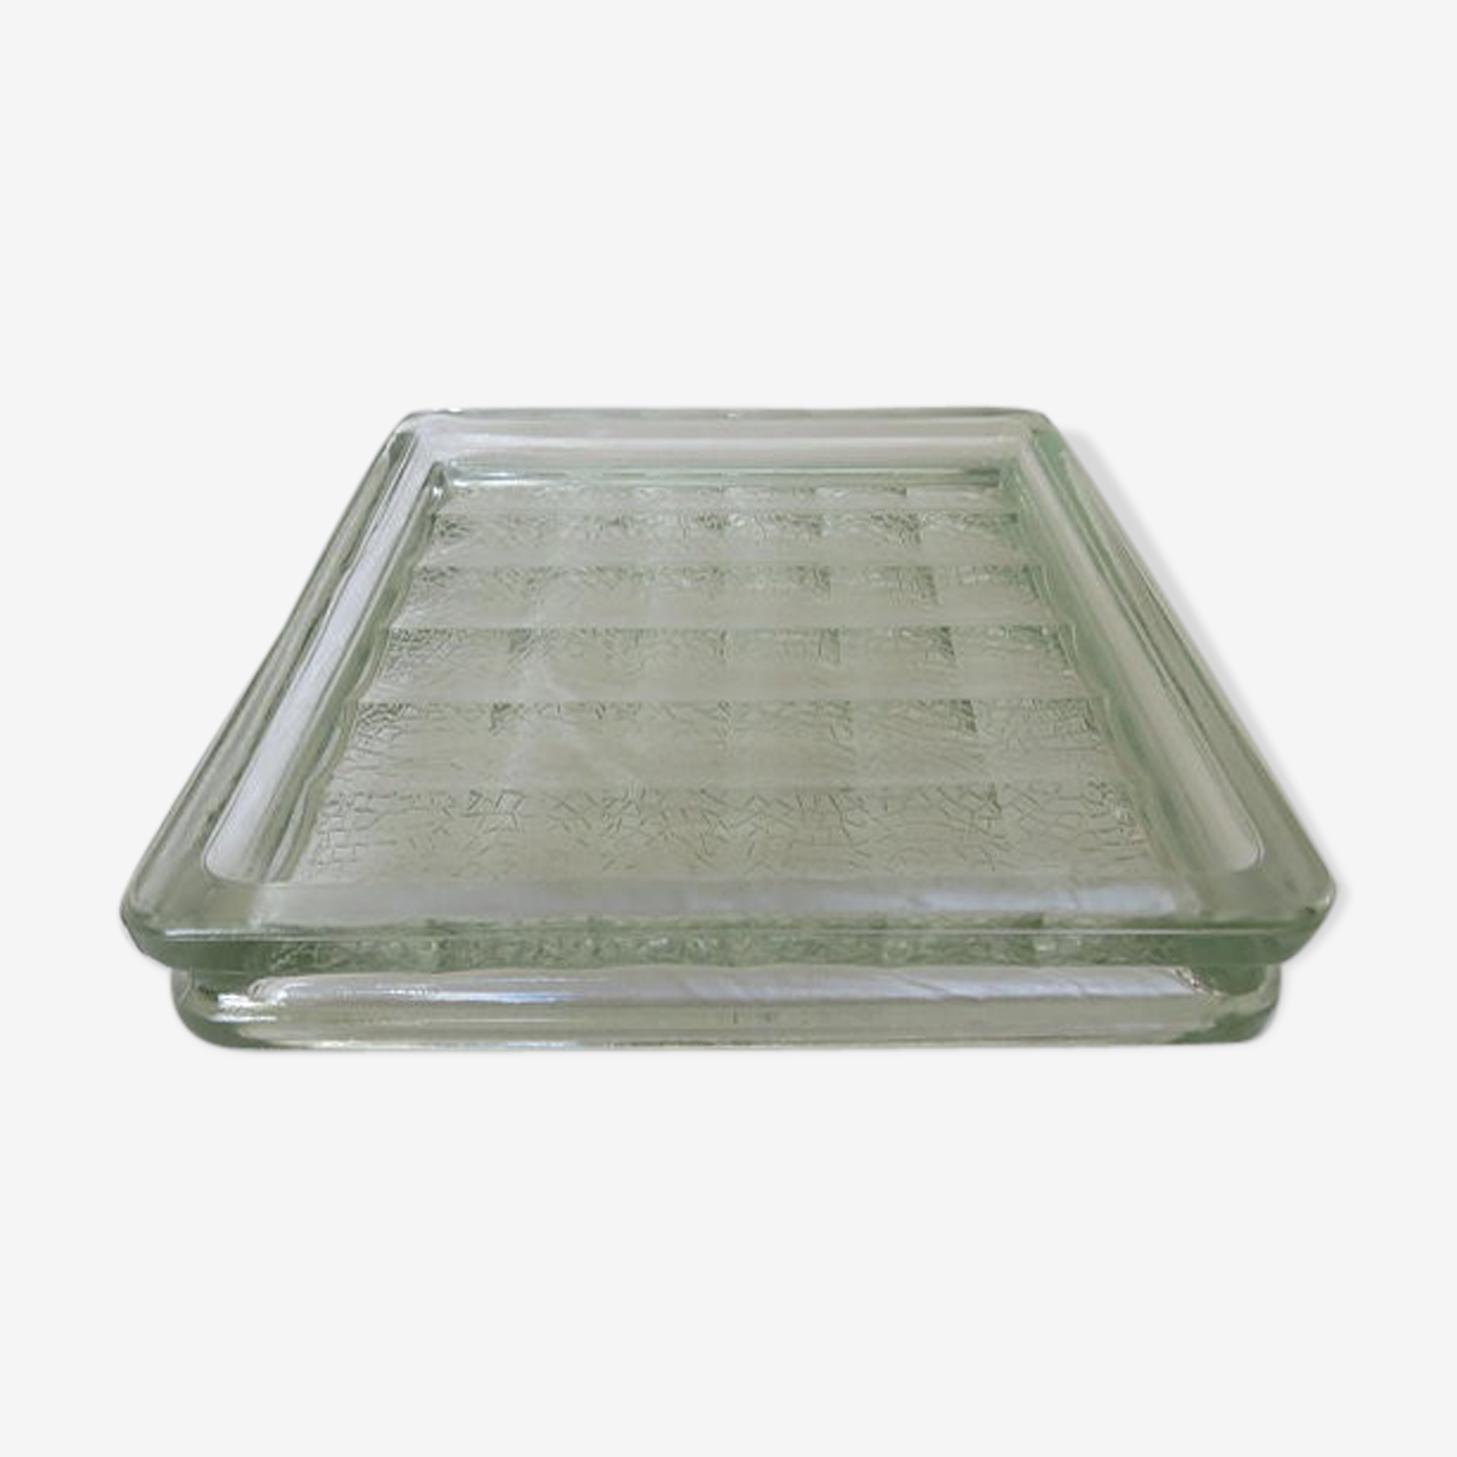 Paved  glass ashtray 50s 60s